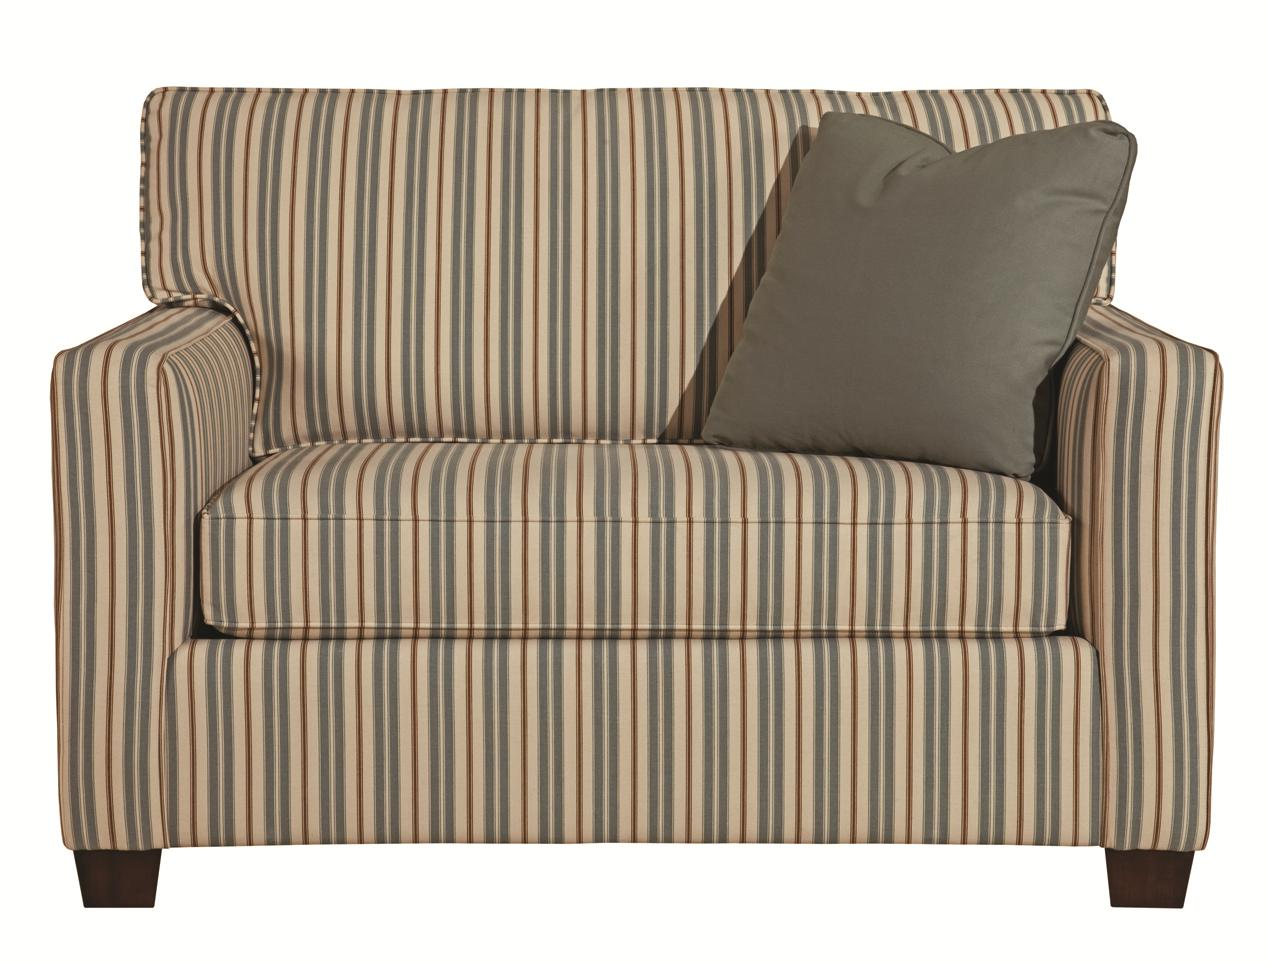 Brooke Sleeper Chair by Kincaid Furniture at Stuckey Furniture